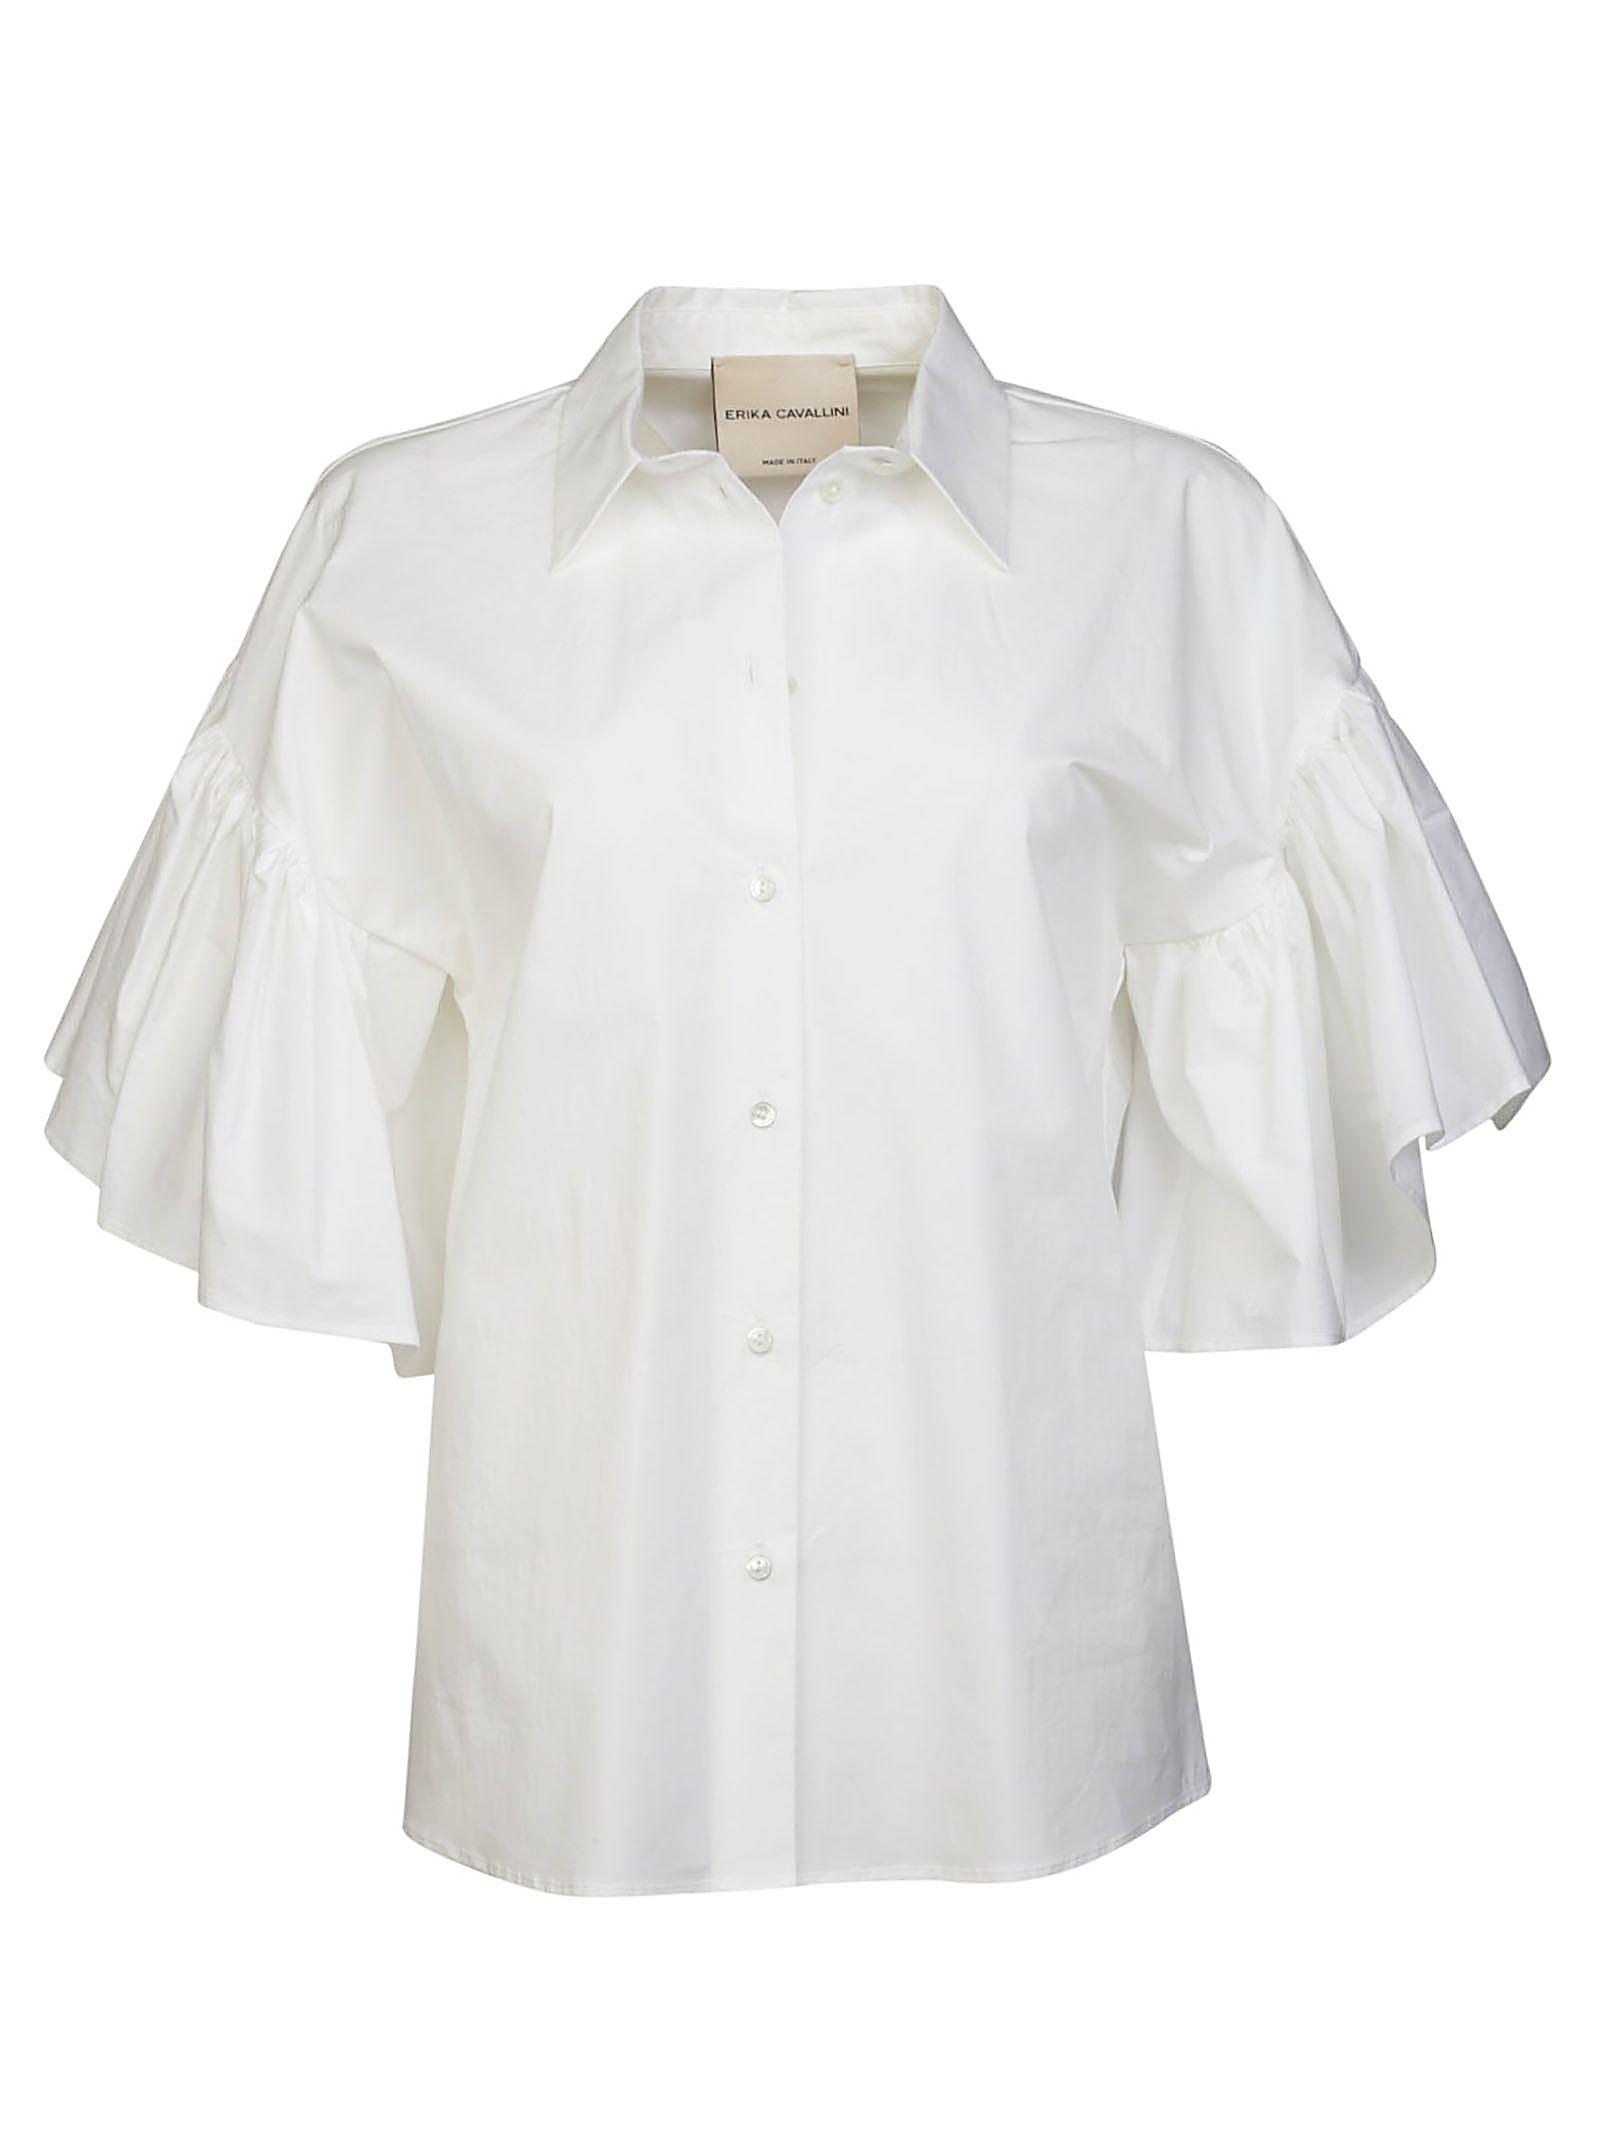 Erika Cavallini Ruffled Sleeves Shirt